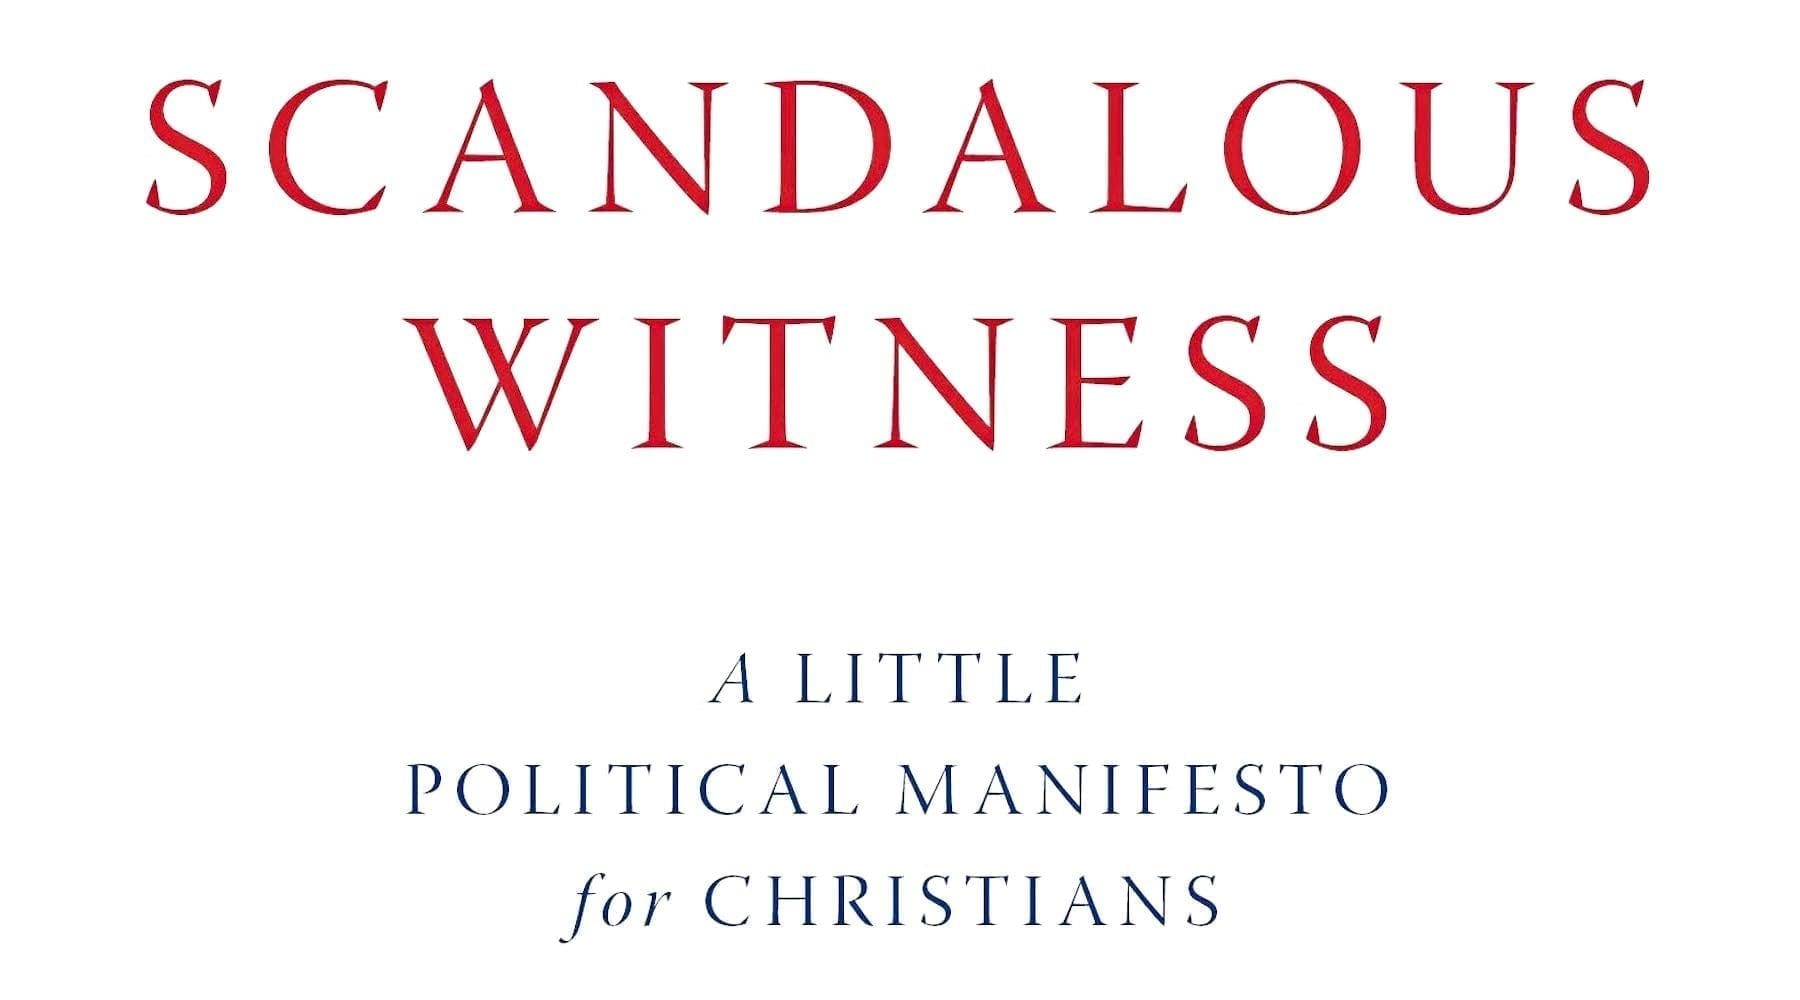 'Scandalous Witness'